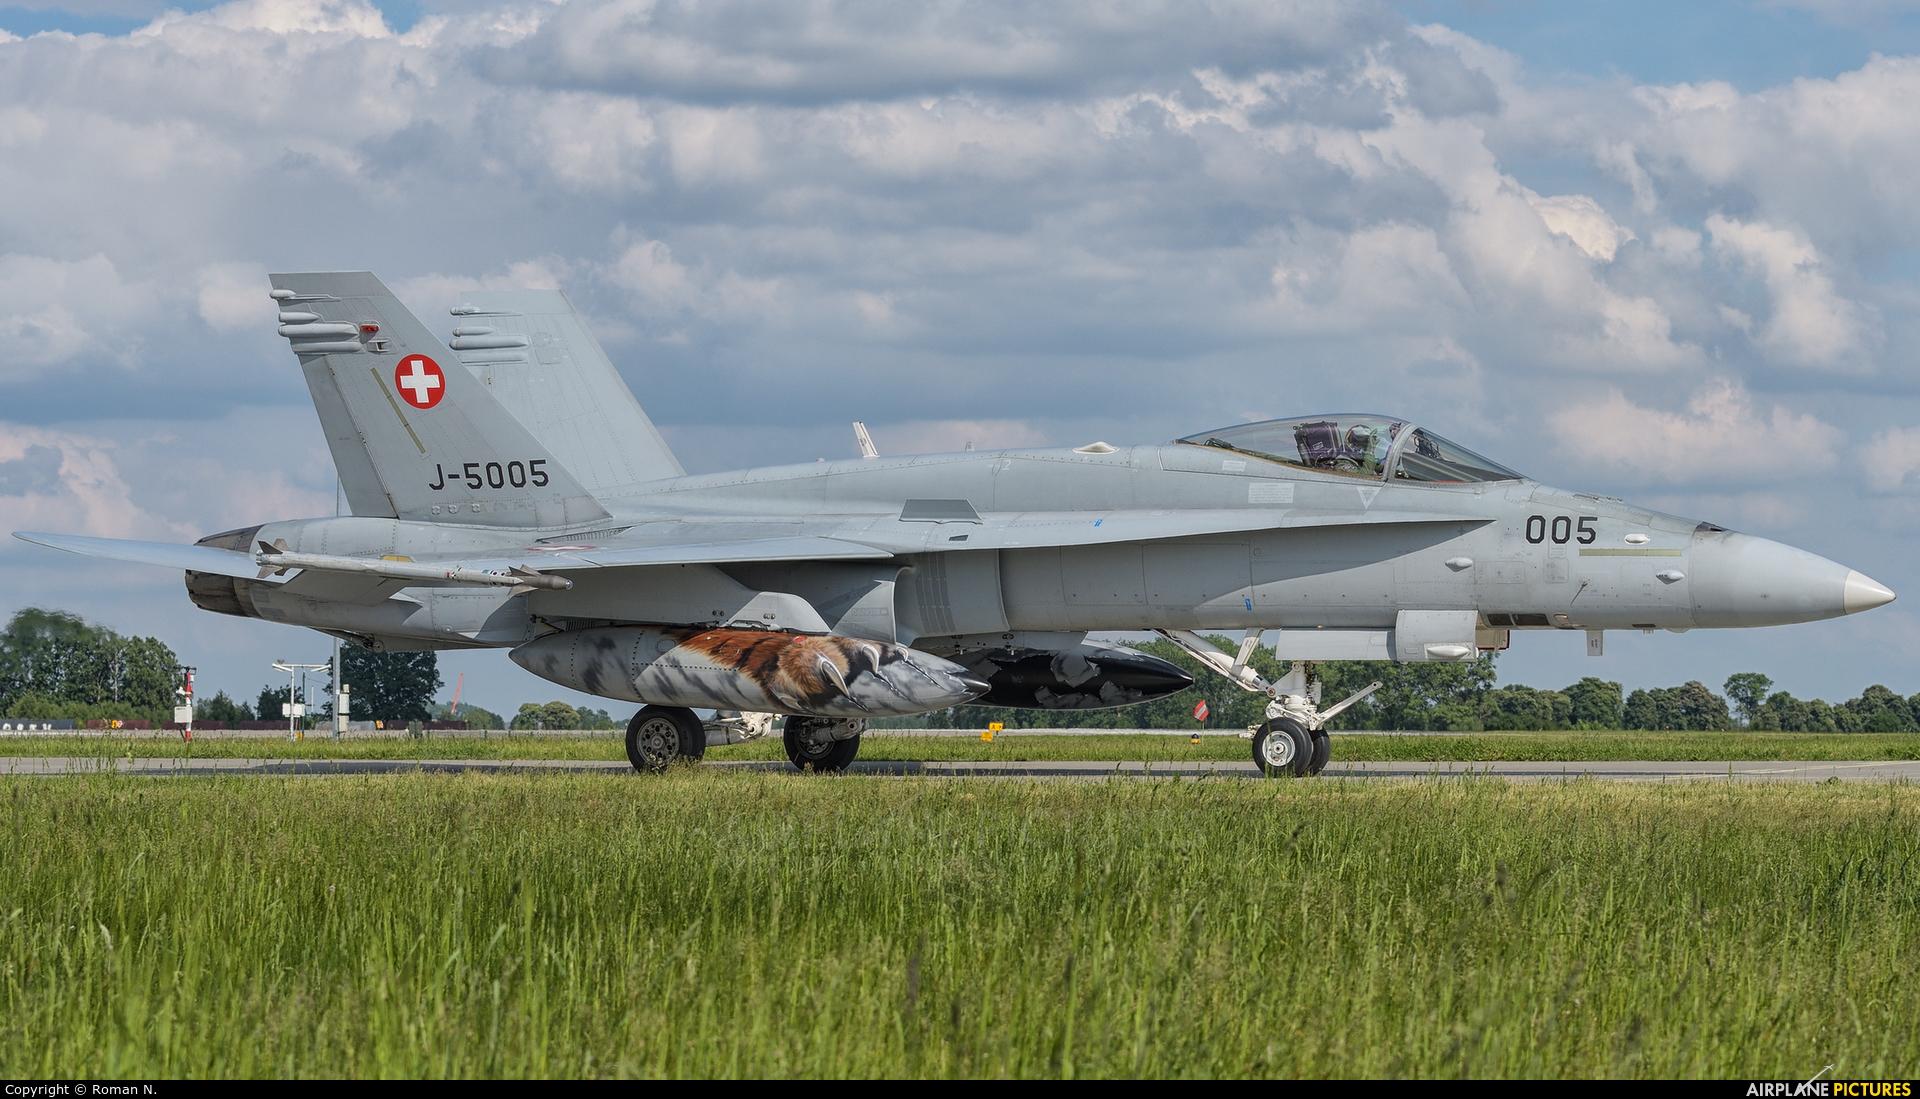 Switzerland - Air Force J-5005 aircraft at Poznań - Krzesiny